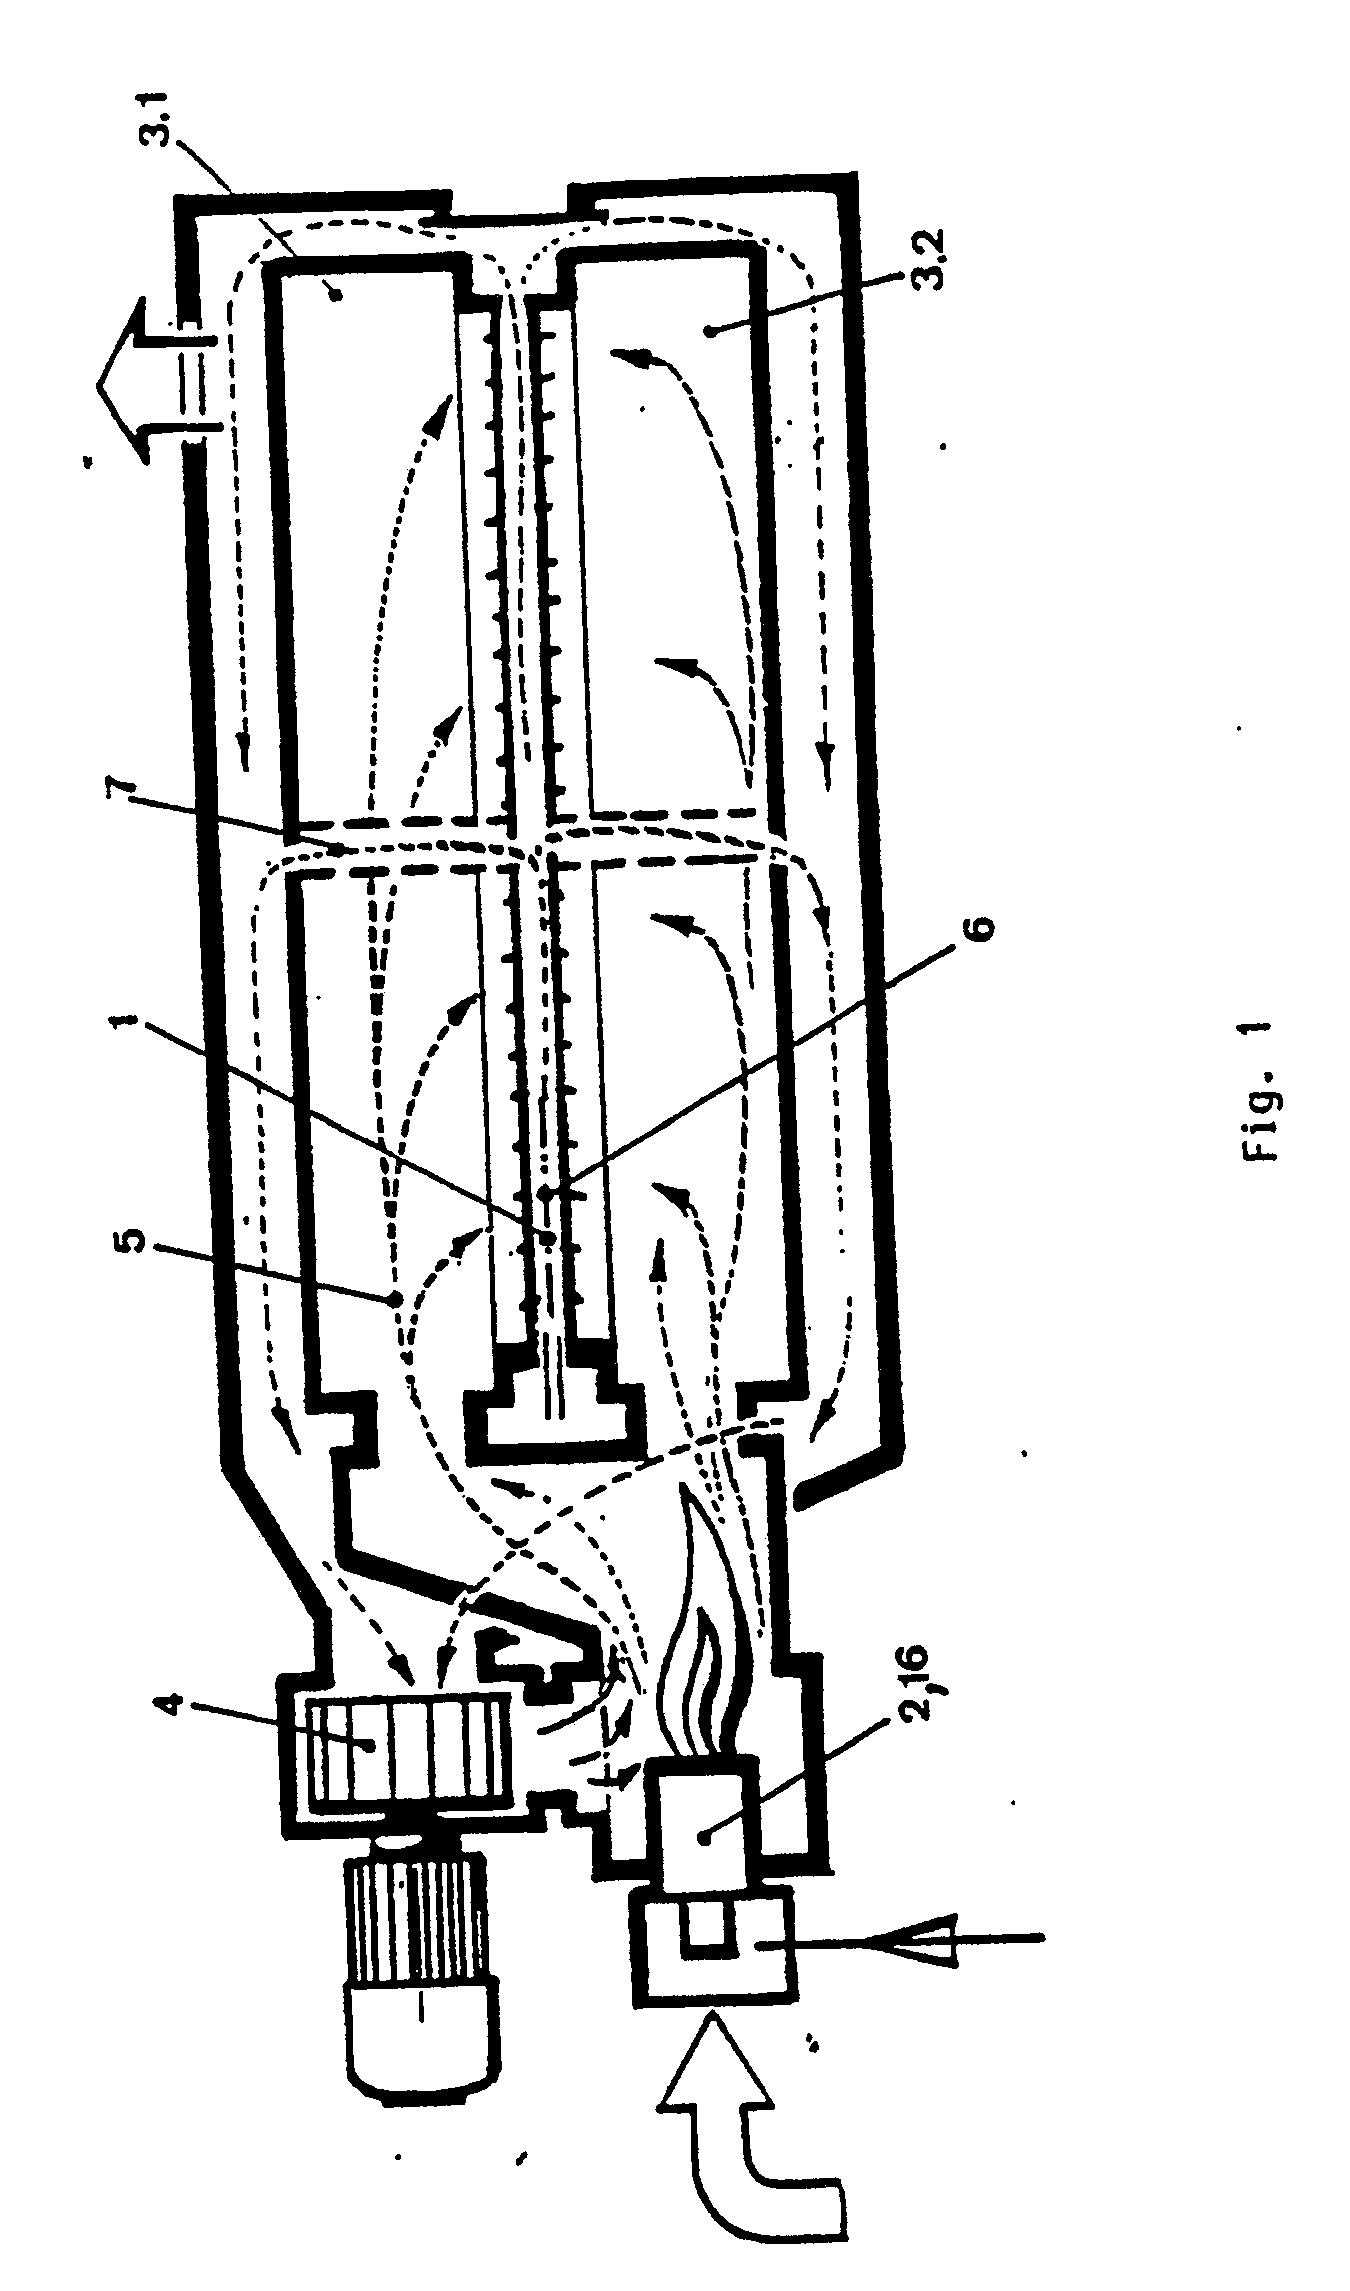 patent ep0379891a2